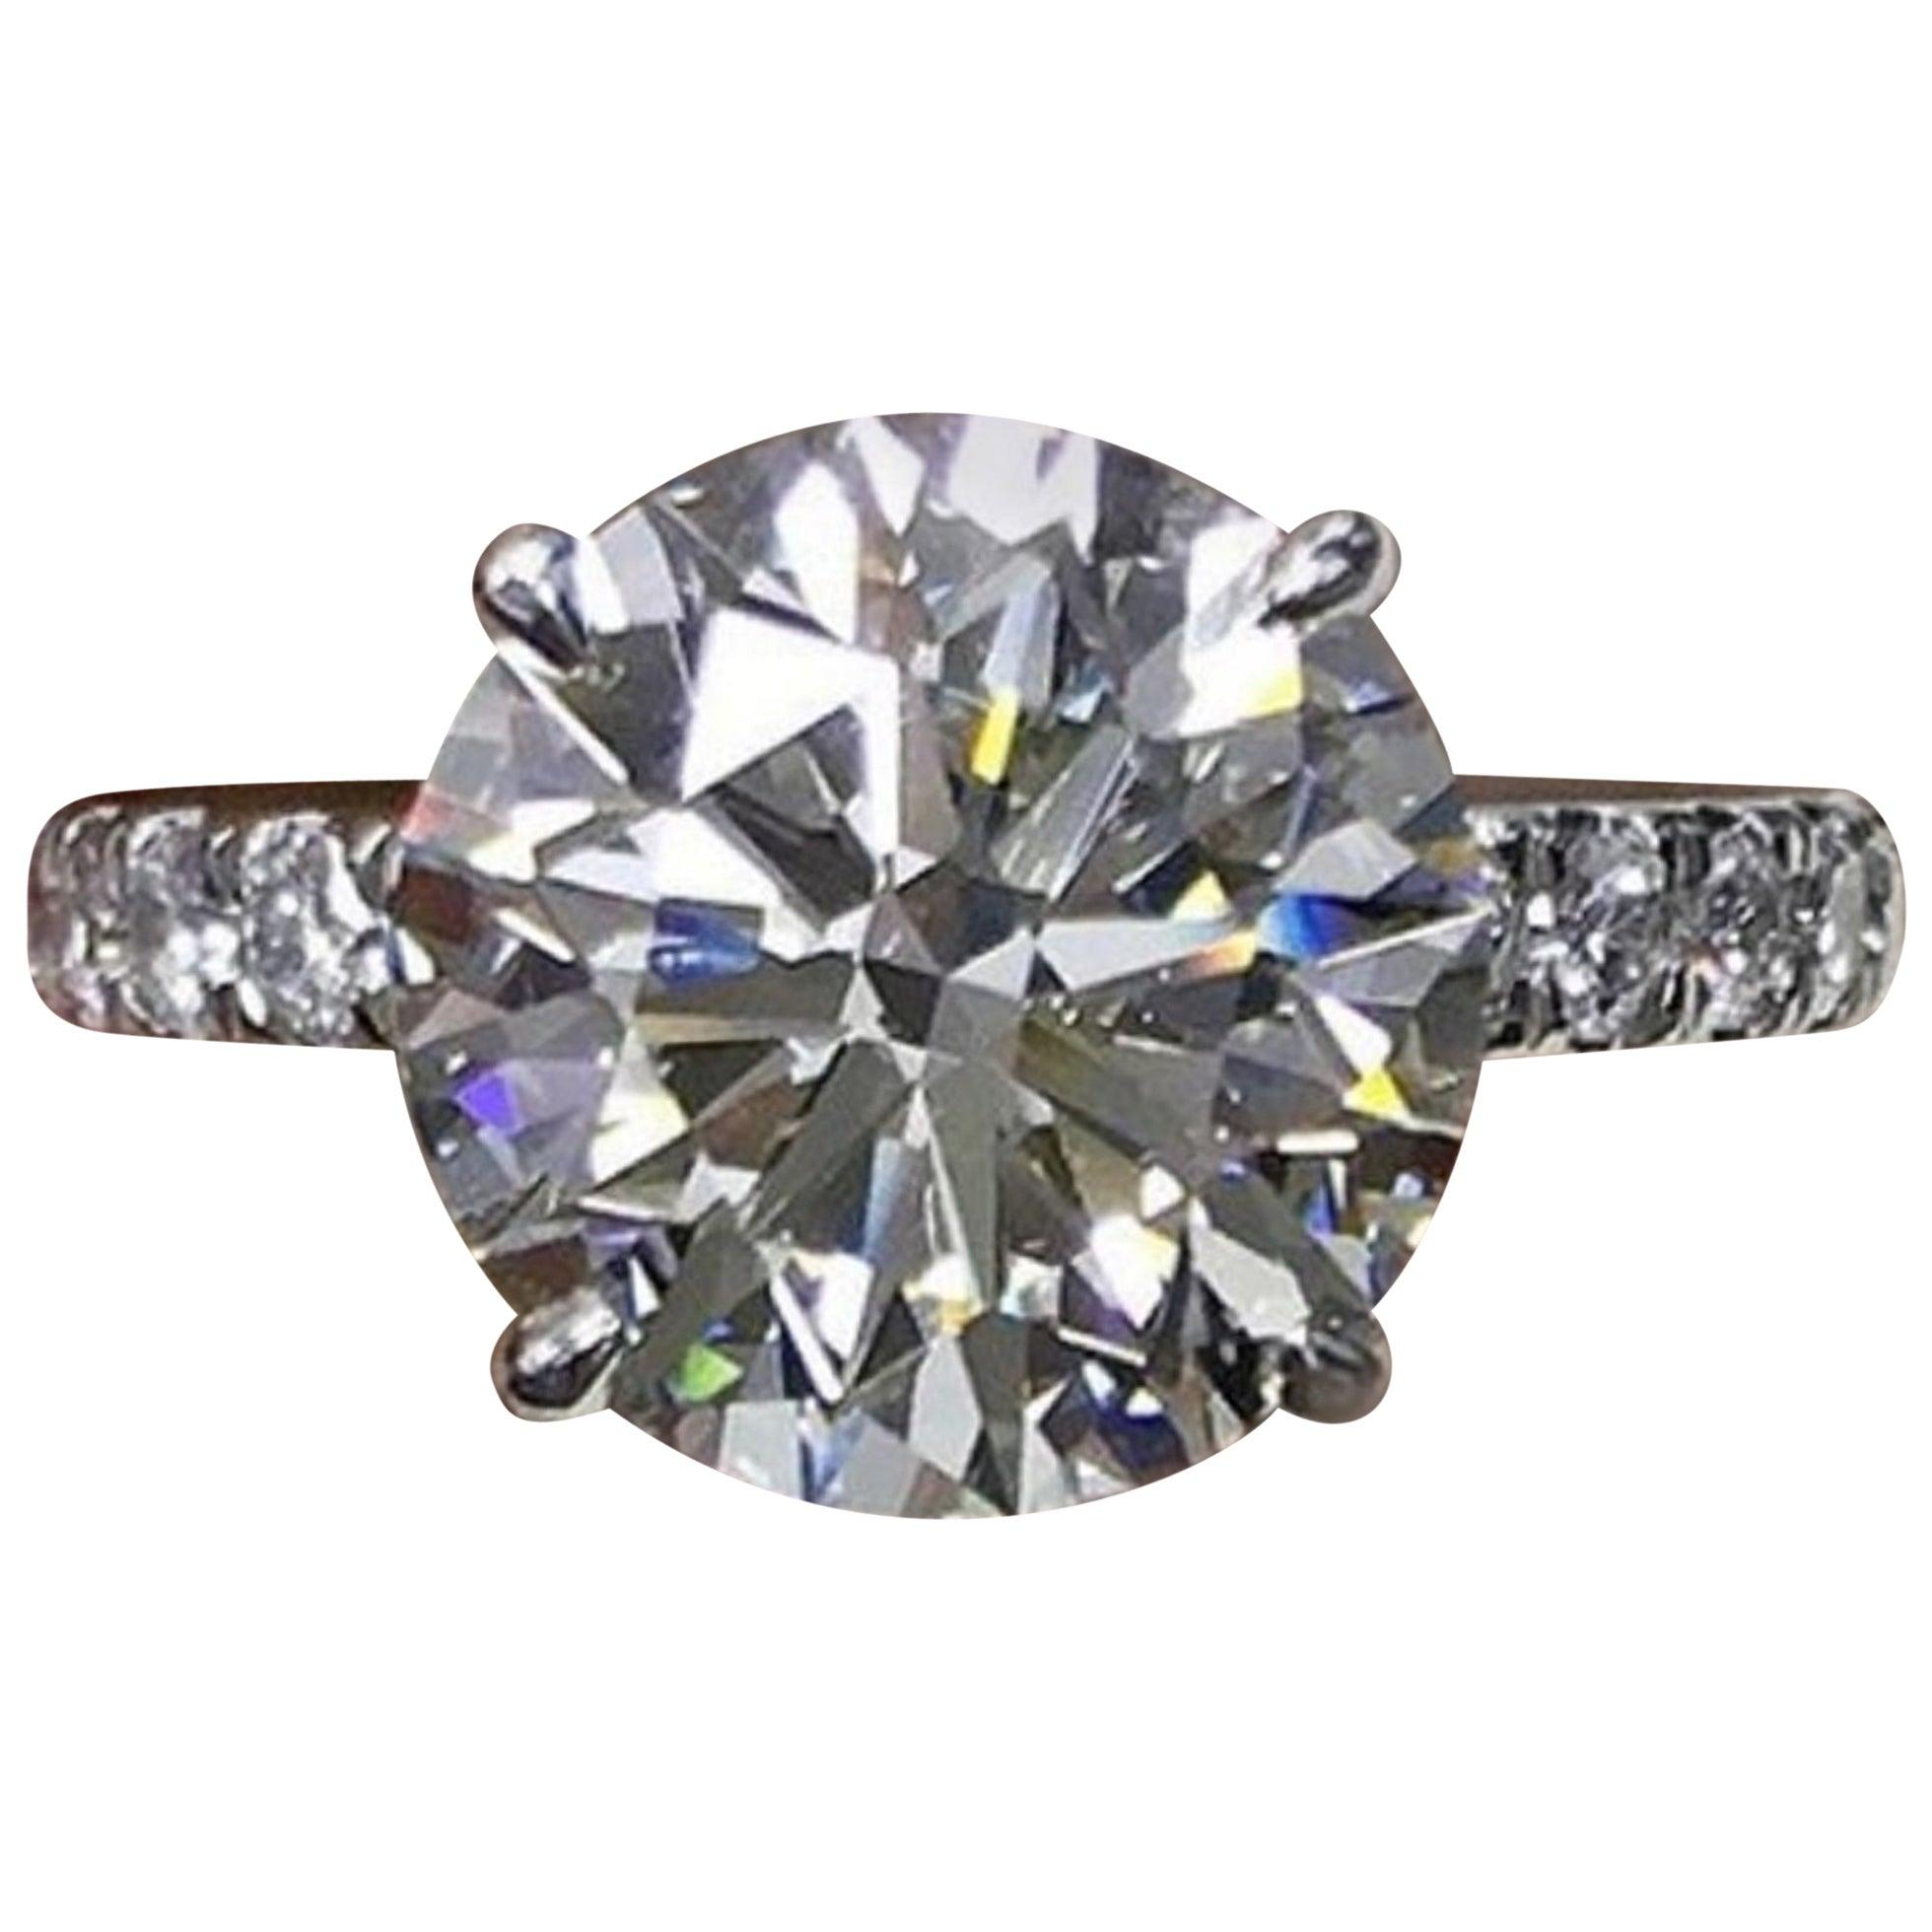 GIA Certified 10.80 Carat Round Brilliant Cut Diamond Ring